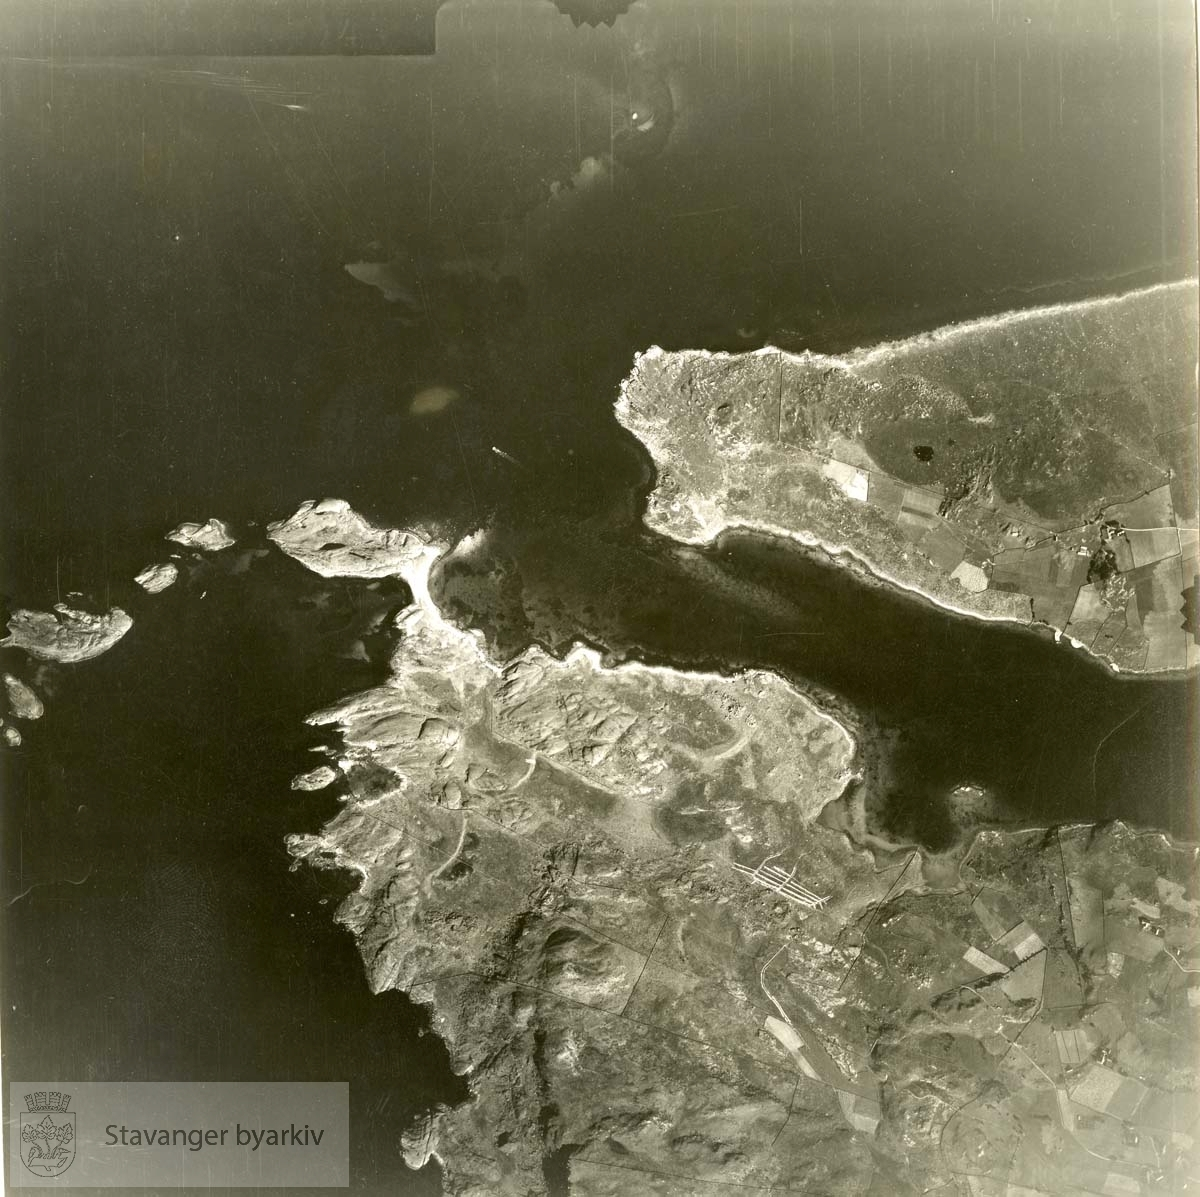 Jfr. kart/fotoplan C46/434..Bru og Sokn..Se ByStW_Uca_002 (kan lastes ned under fanen for kart på Stavangerbilder)